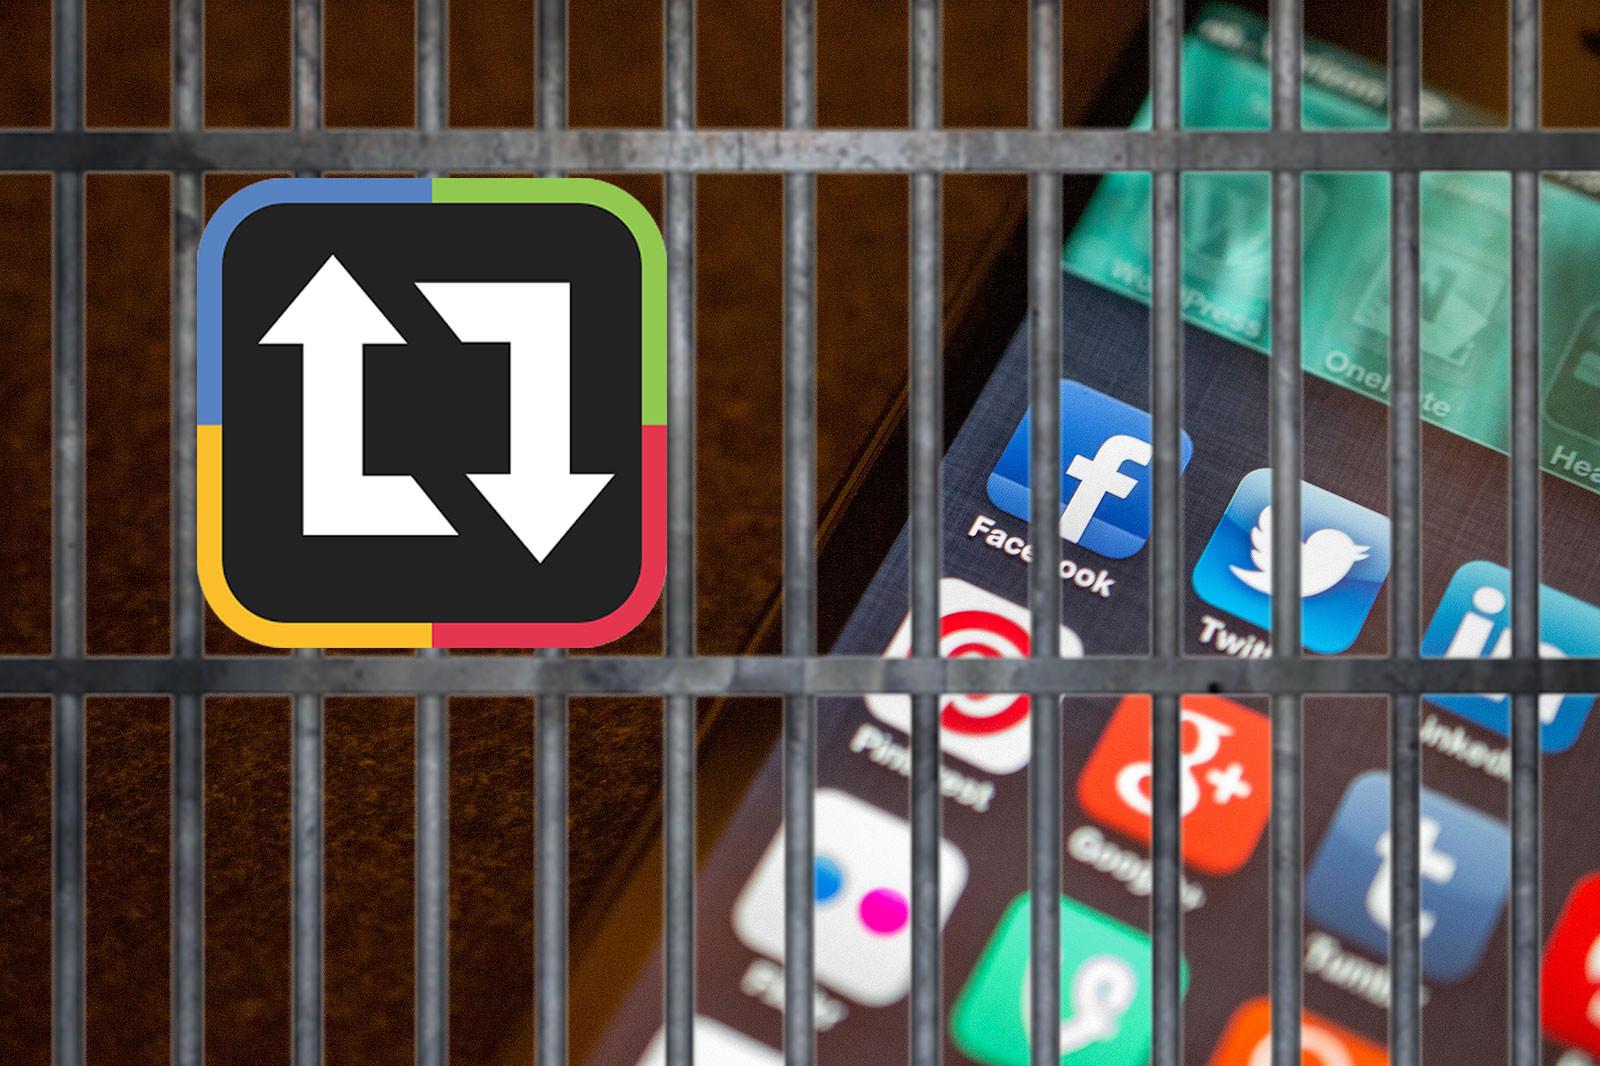 "<p>Коллаж &copy; L!FE. Фото: &copy; Flickr/<a href=""https://www.flickr.com/photos/jasonahowie/"" title=""Go to Jason Howie's photostream"" data-track=""attributionNameClick"" data-rapid_p=""49"">Jason Howie</a></p>"